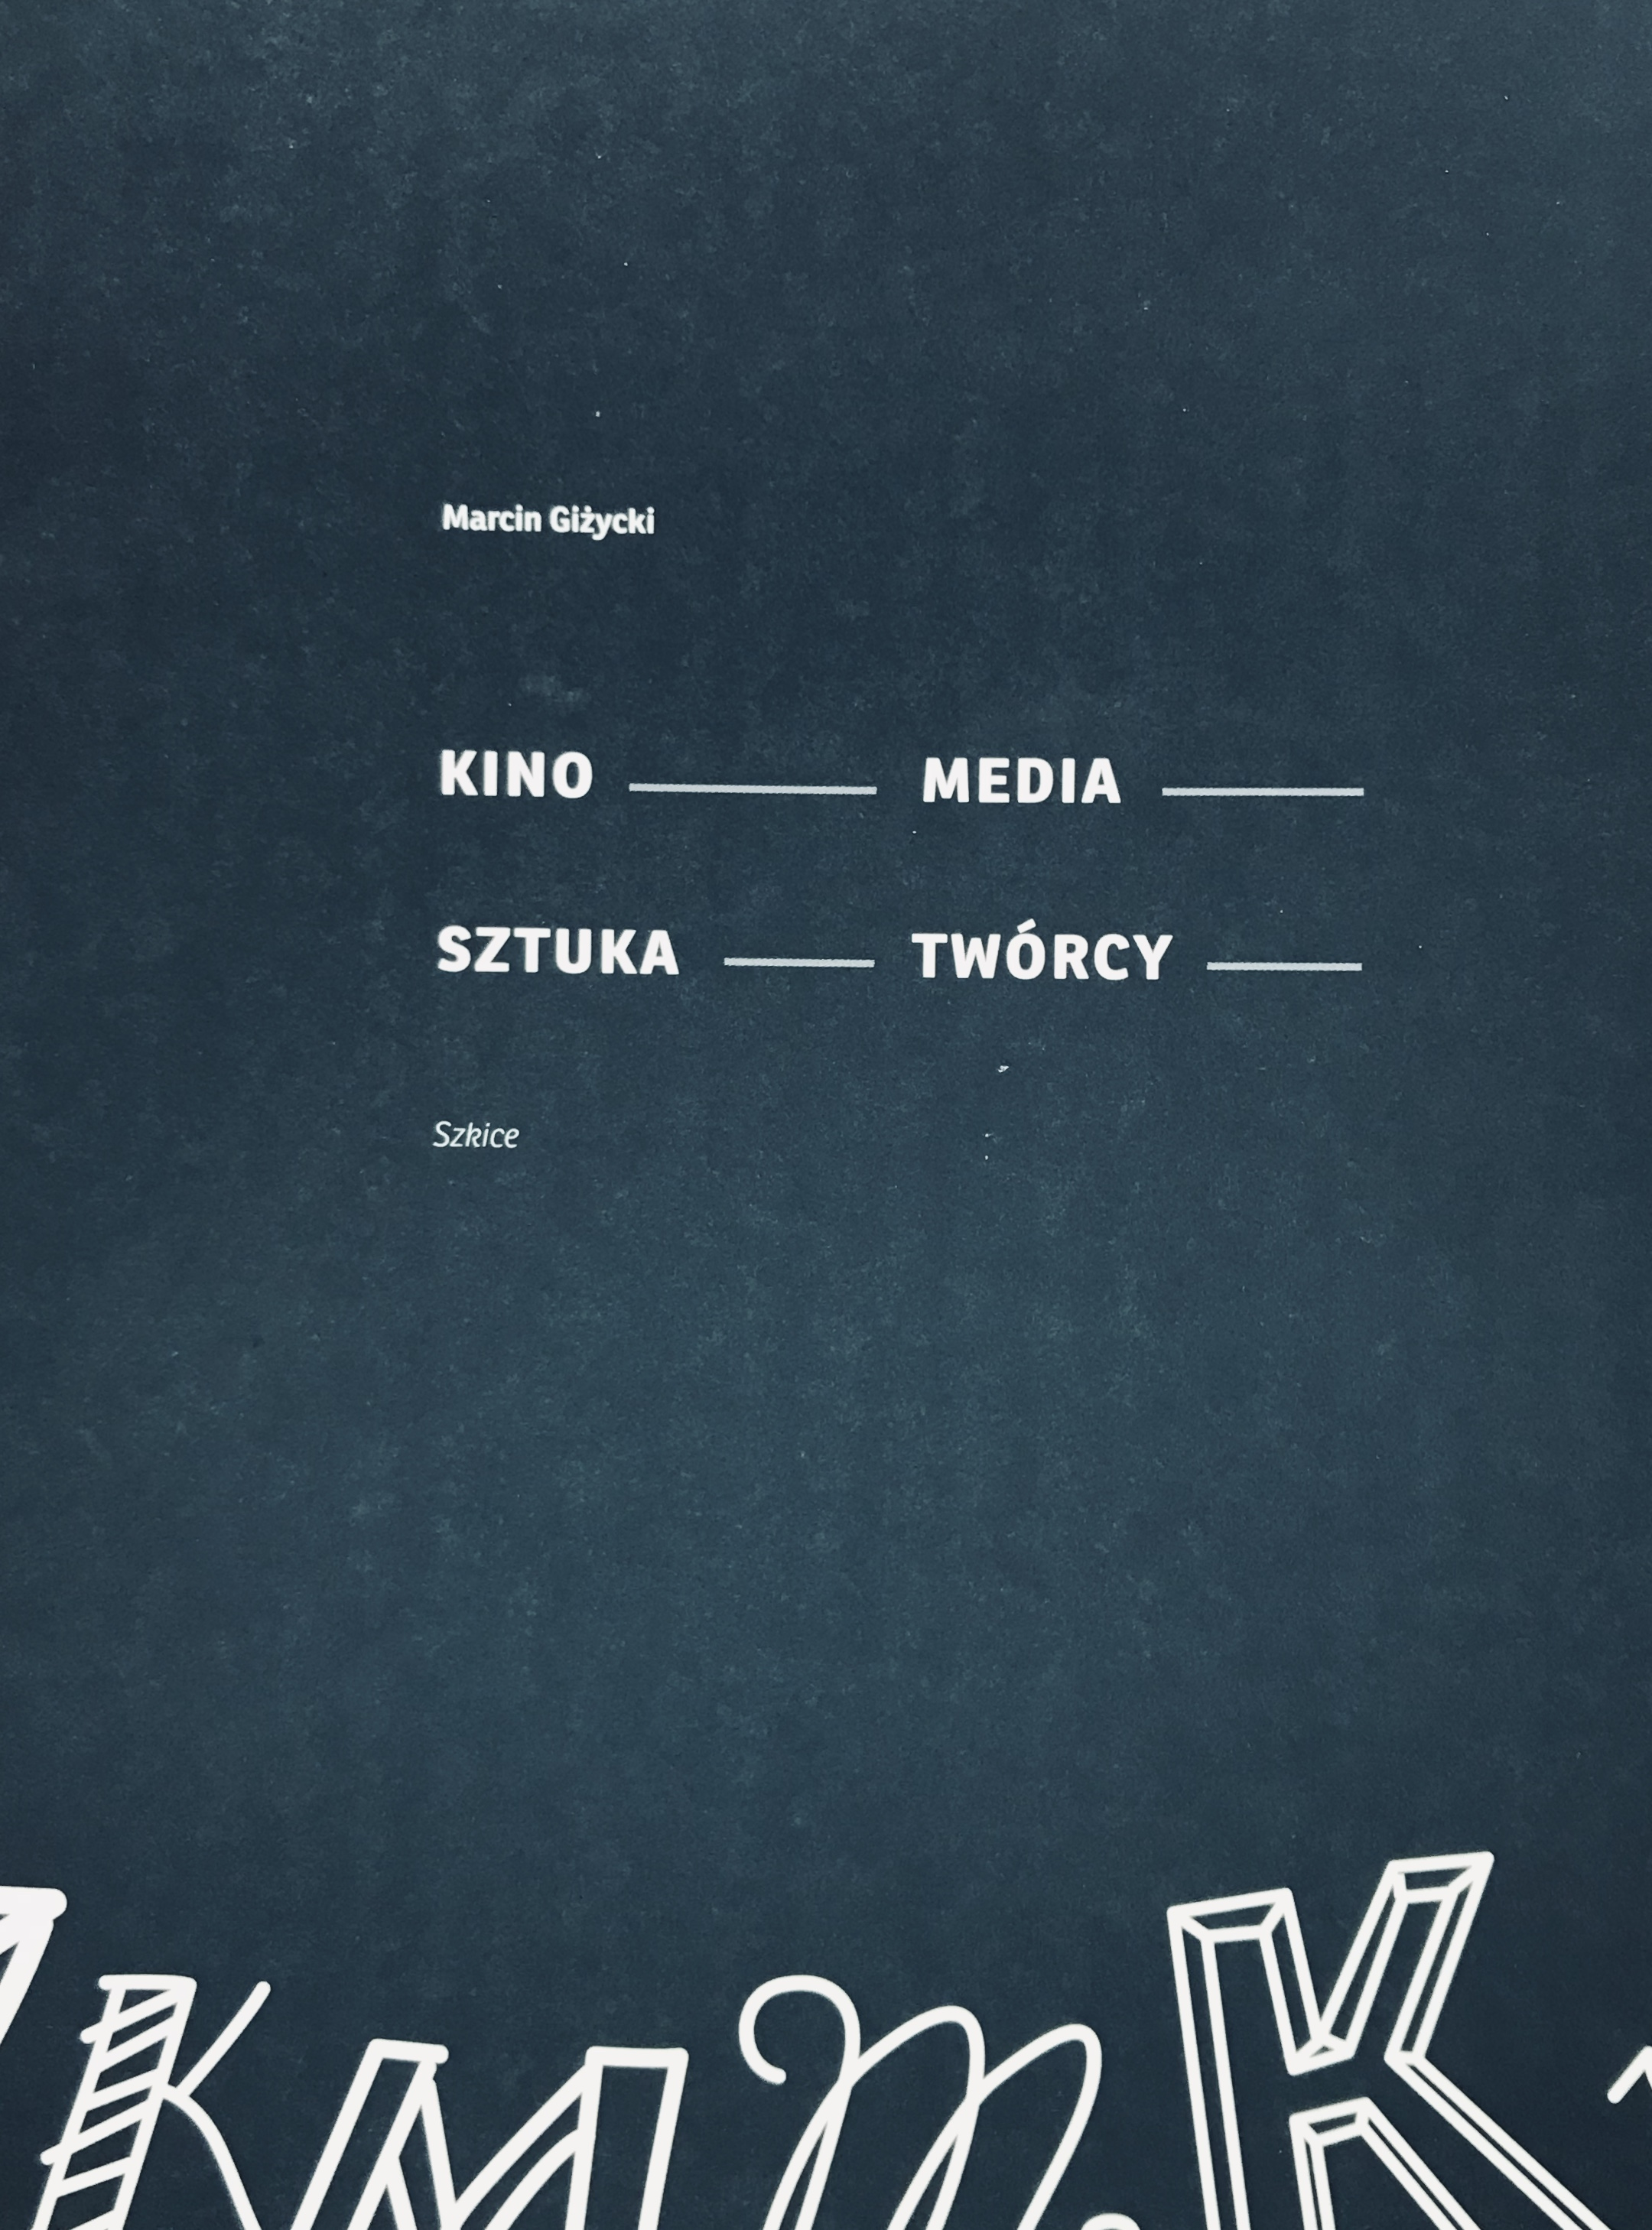 Kino/Media/Sztuka/Tworcy